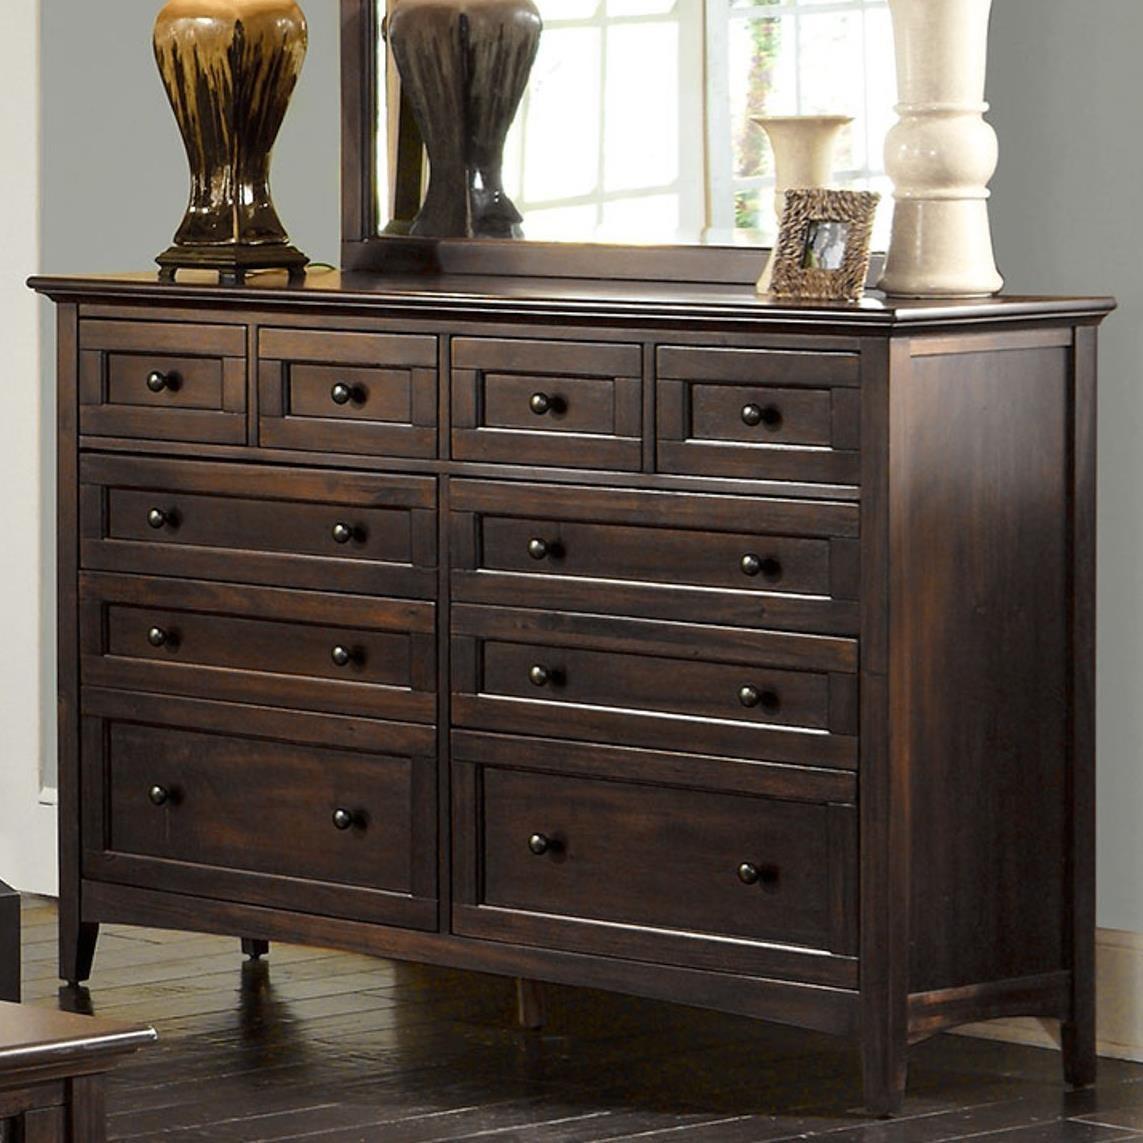 Westlake Dresser by A-A at Walker's Furniture